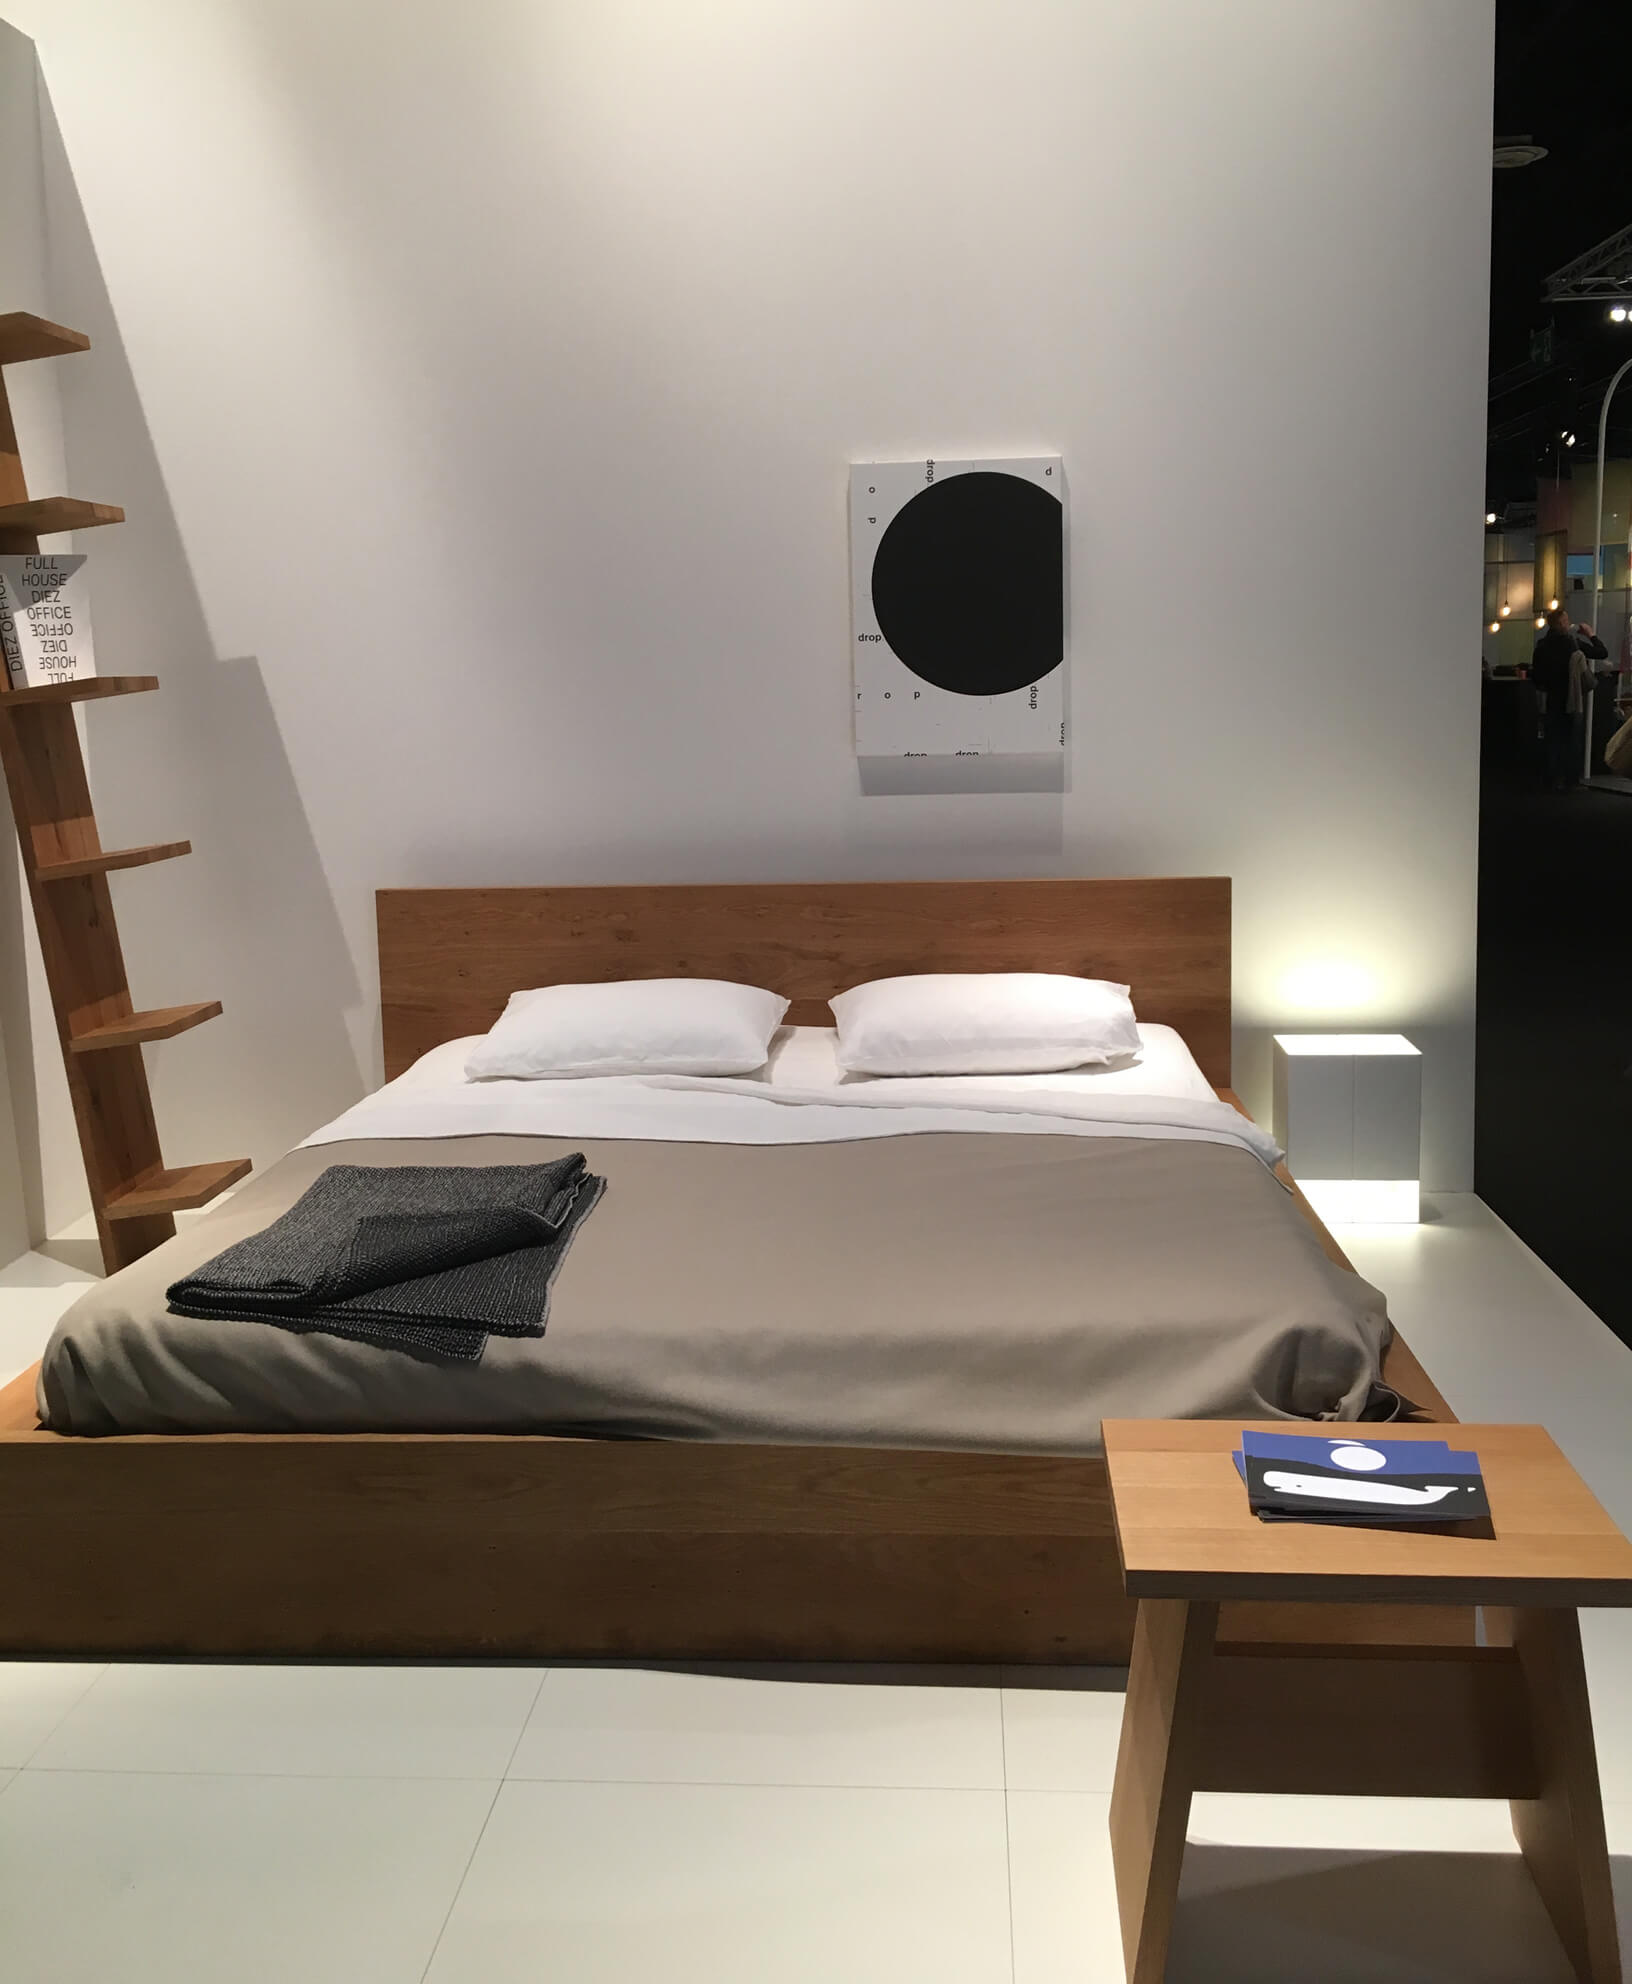 e15, Schlafzimmer